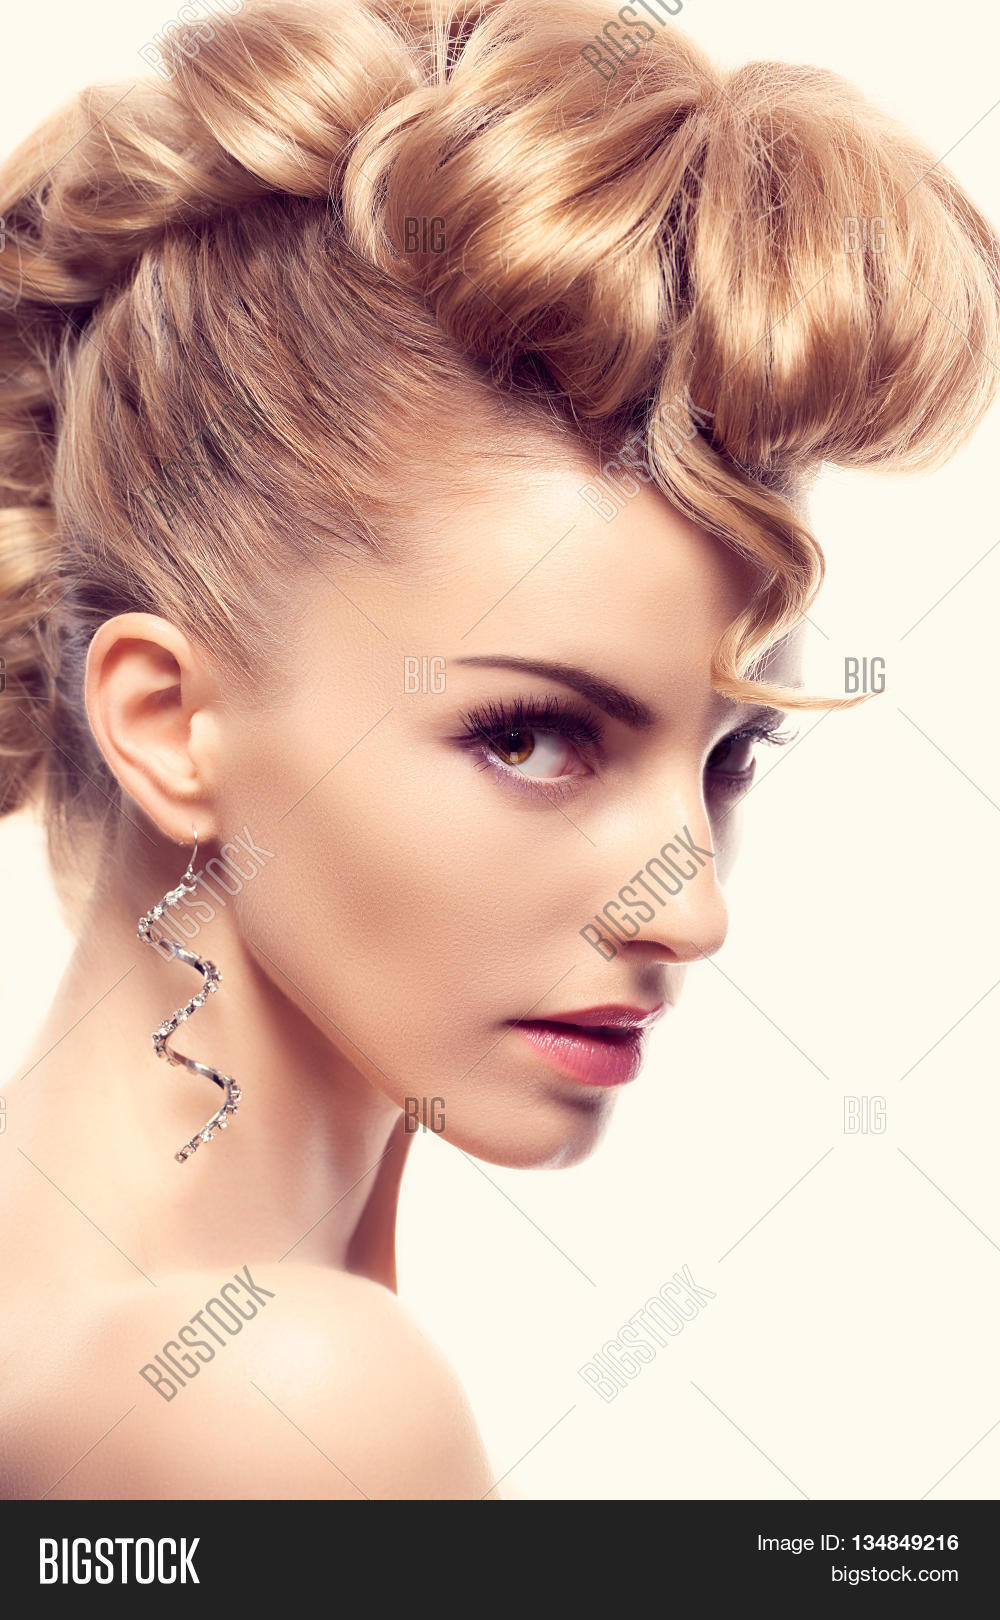 Fashion Mohawk Image Photo Free Trial Bigstock